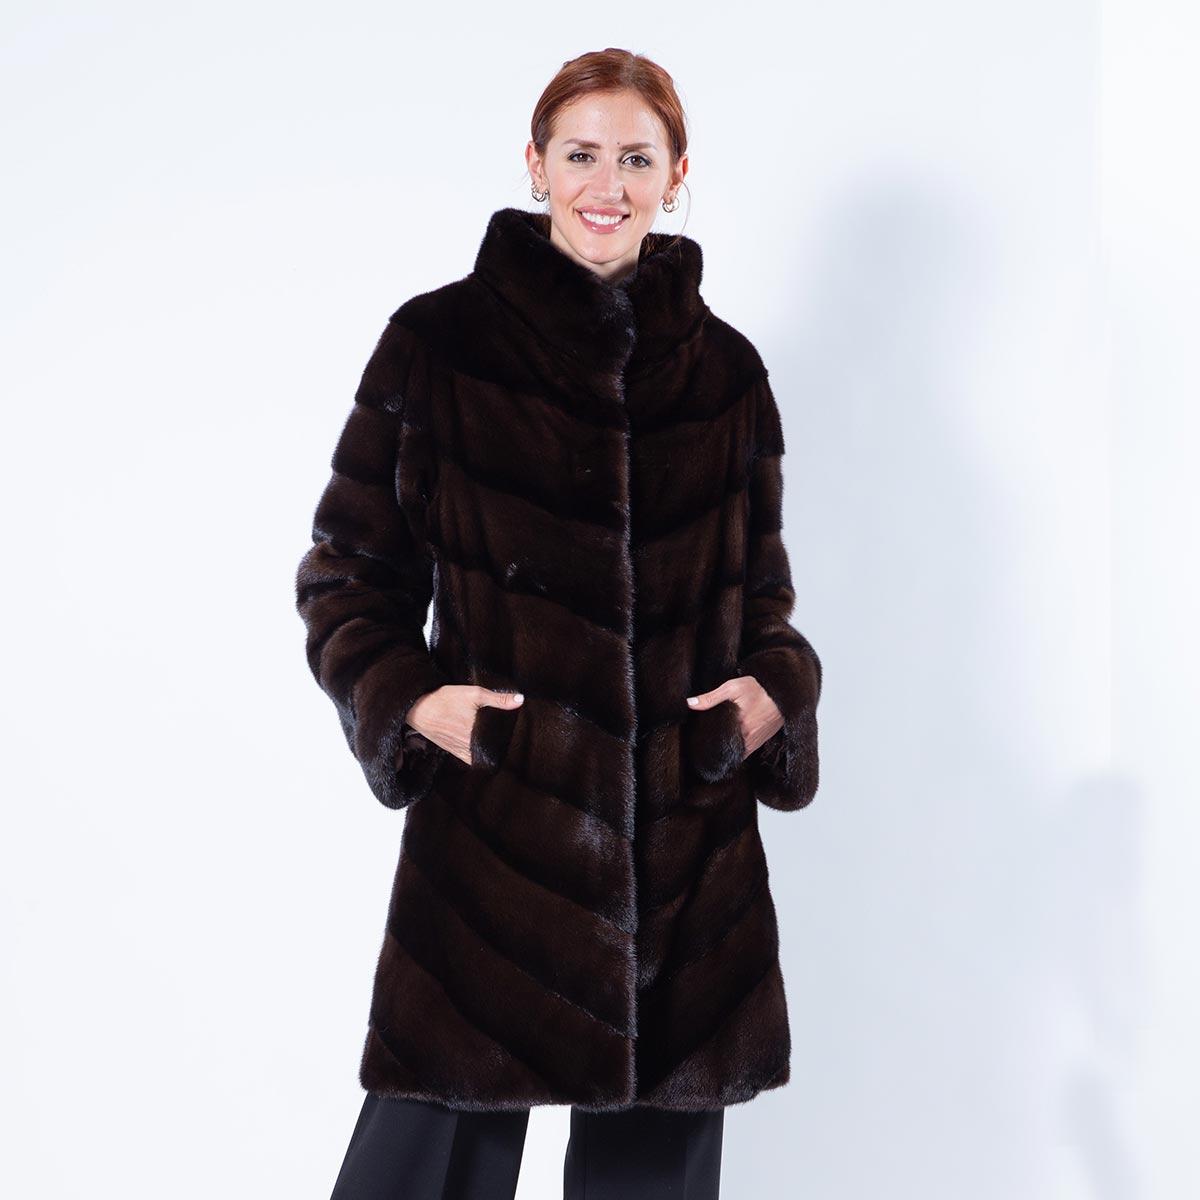 Latin Mahogany Mink Cape with stand collar | Кейп Latin из норки цвета «махагон» - Sarigianni Furs